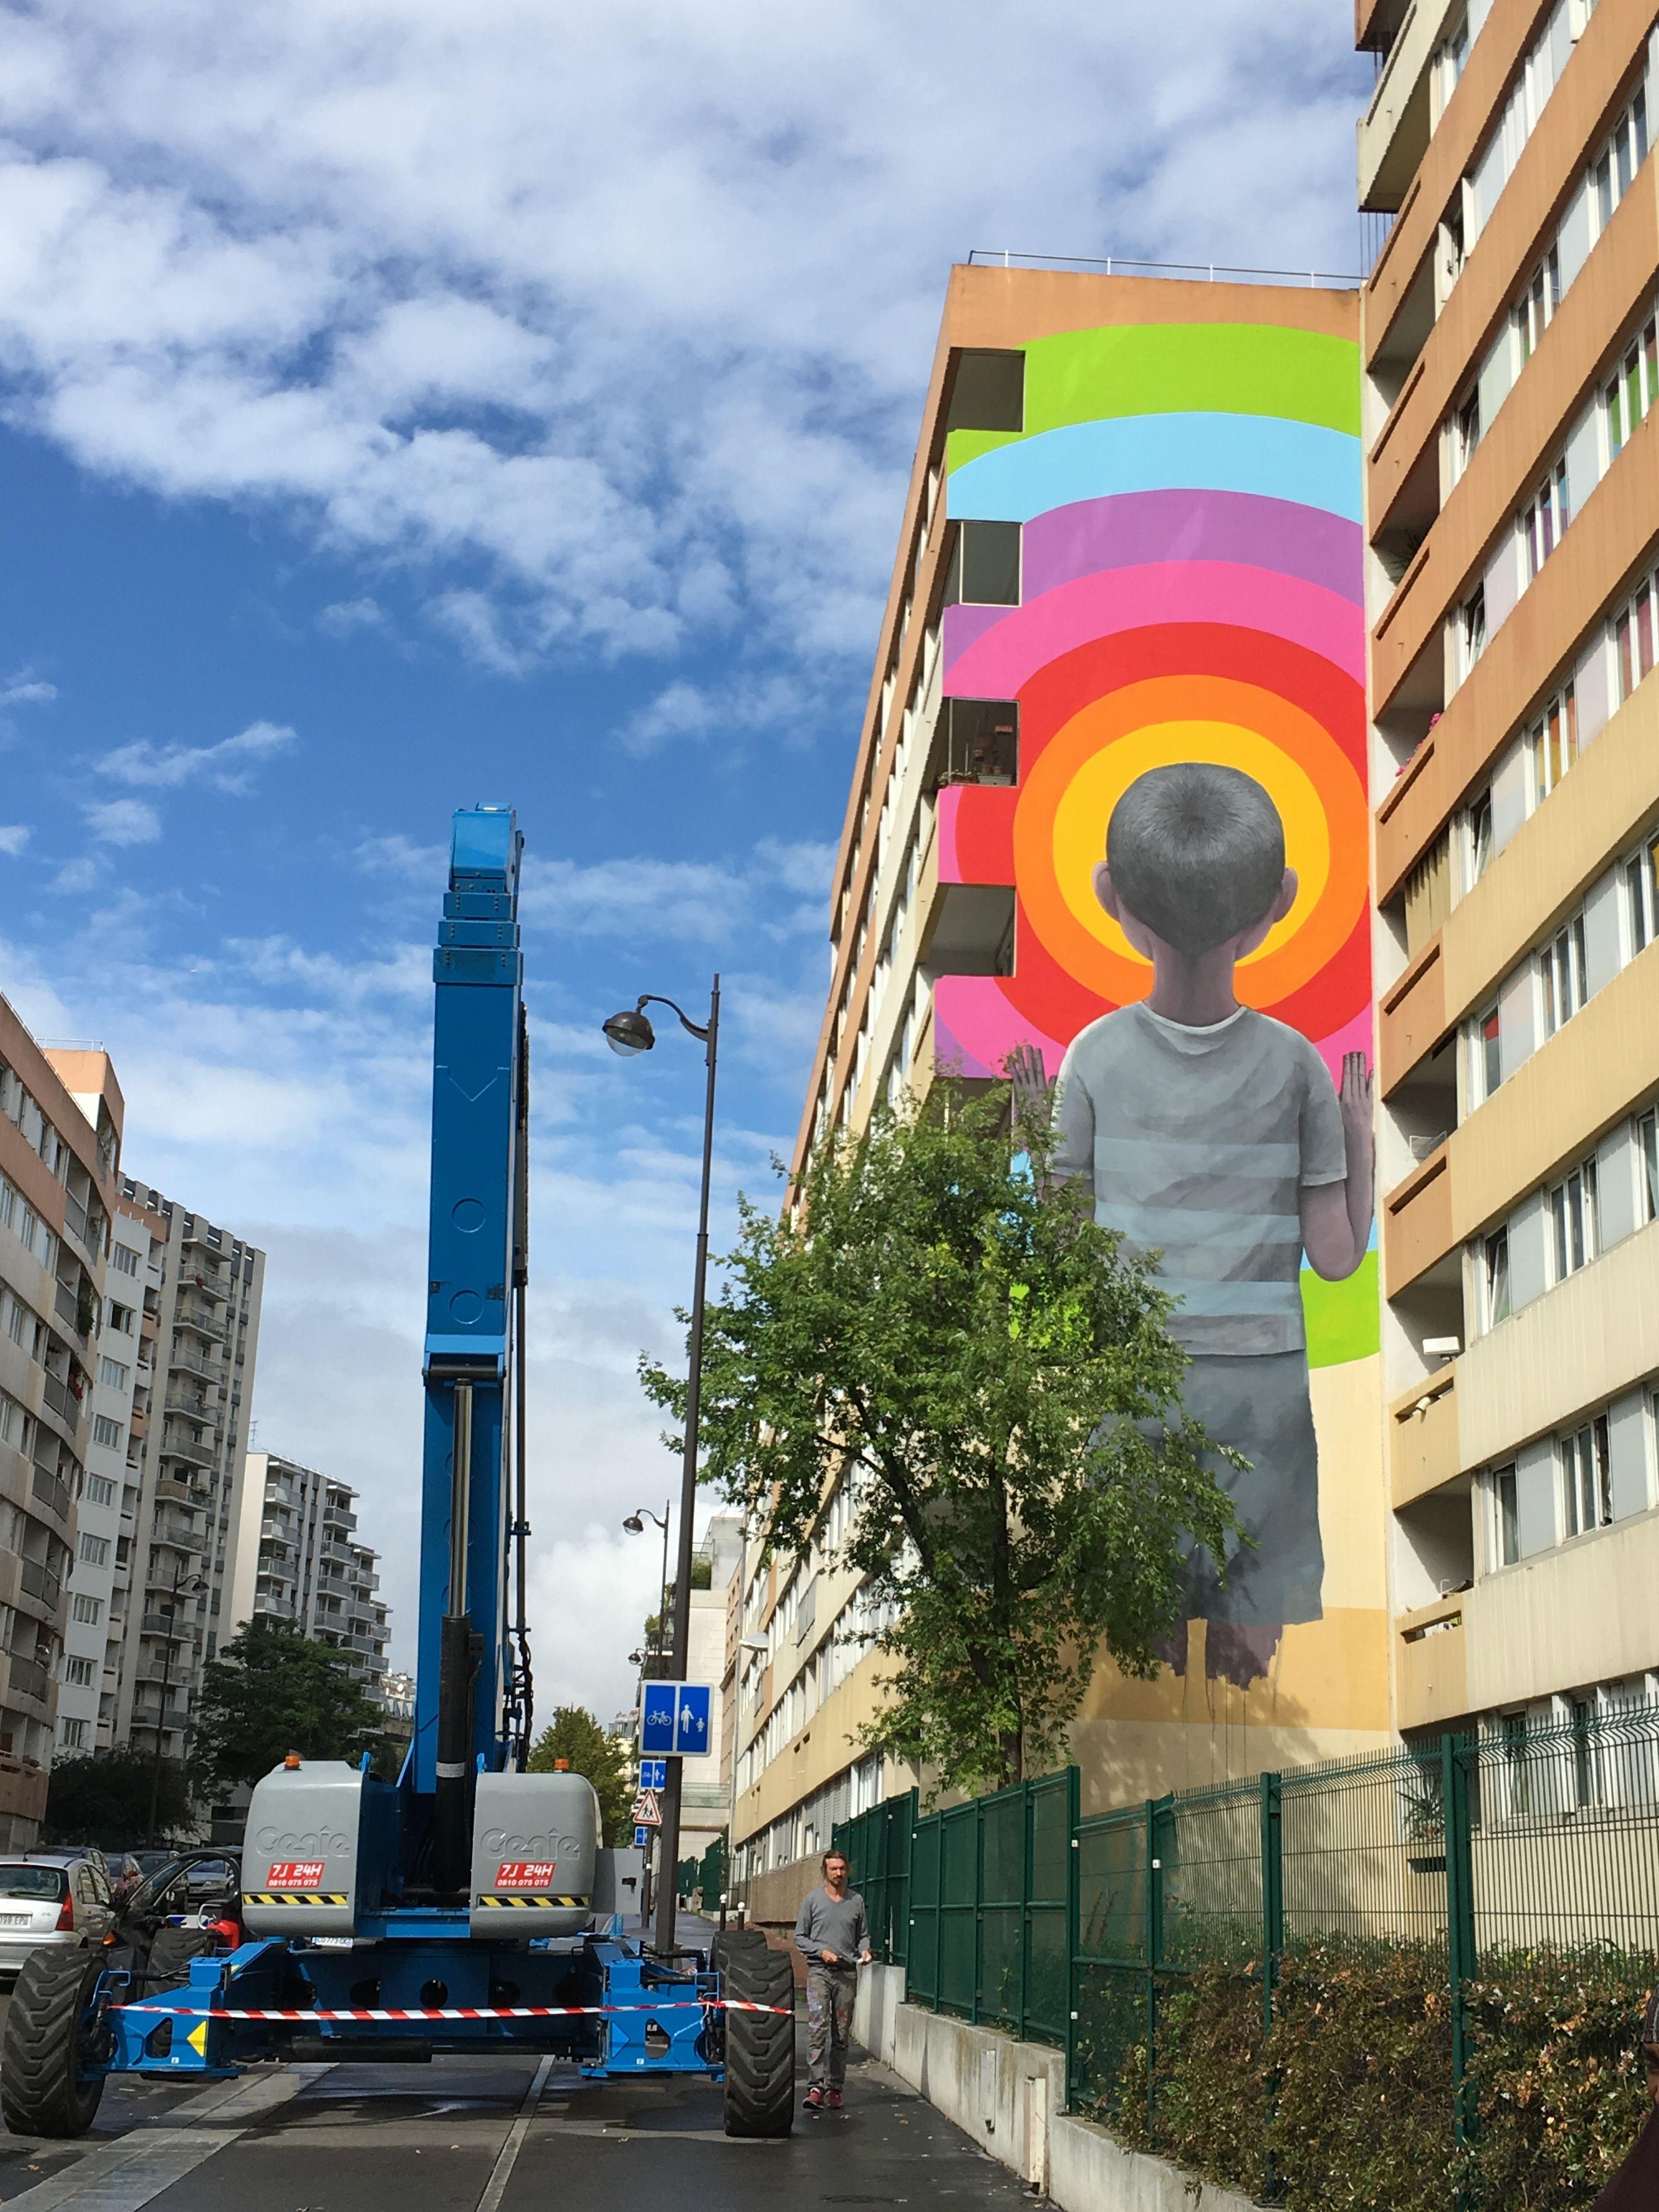 Street art In progress rue Jeanne D'Arc Paris 13eme France seth globepainter l artiste et son œuvre !!